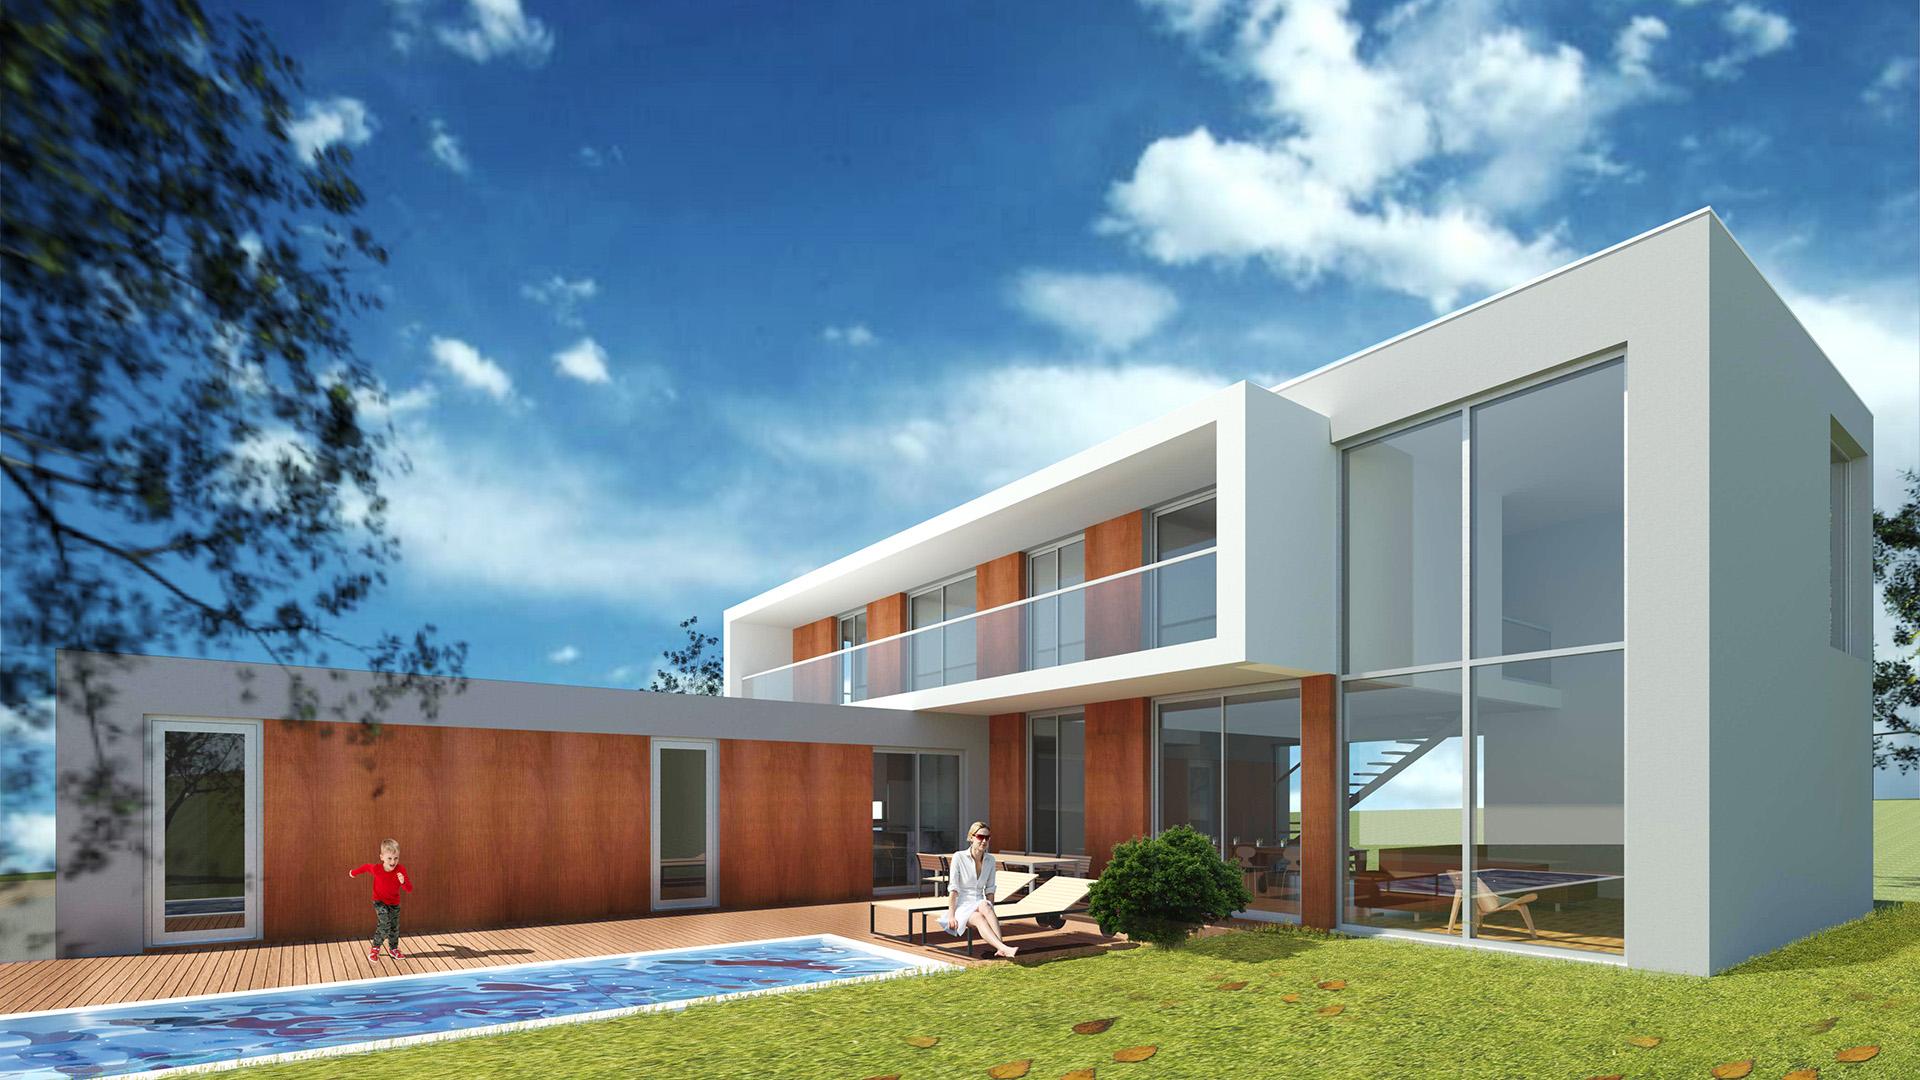 projecto_arquitectura_casa_moderna_bombardeira_2